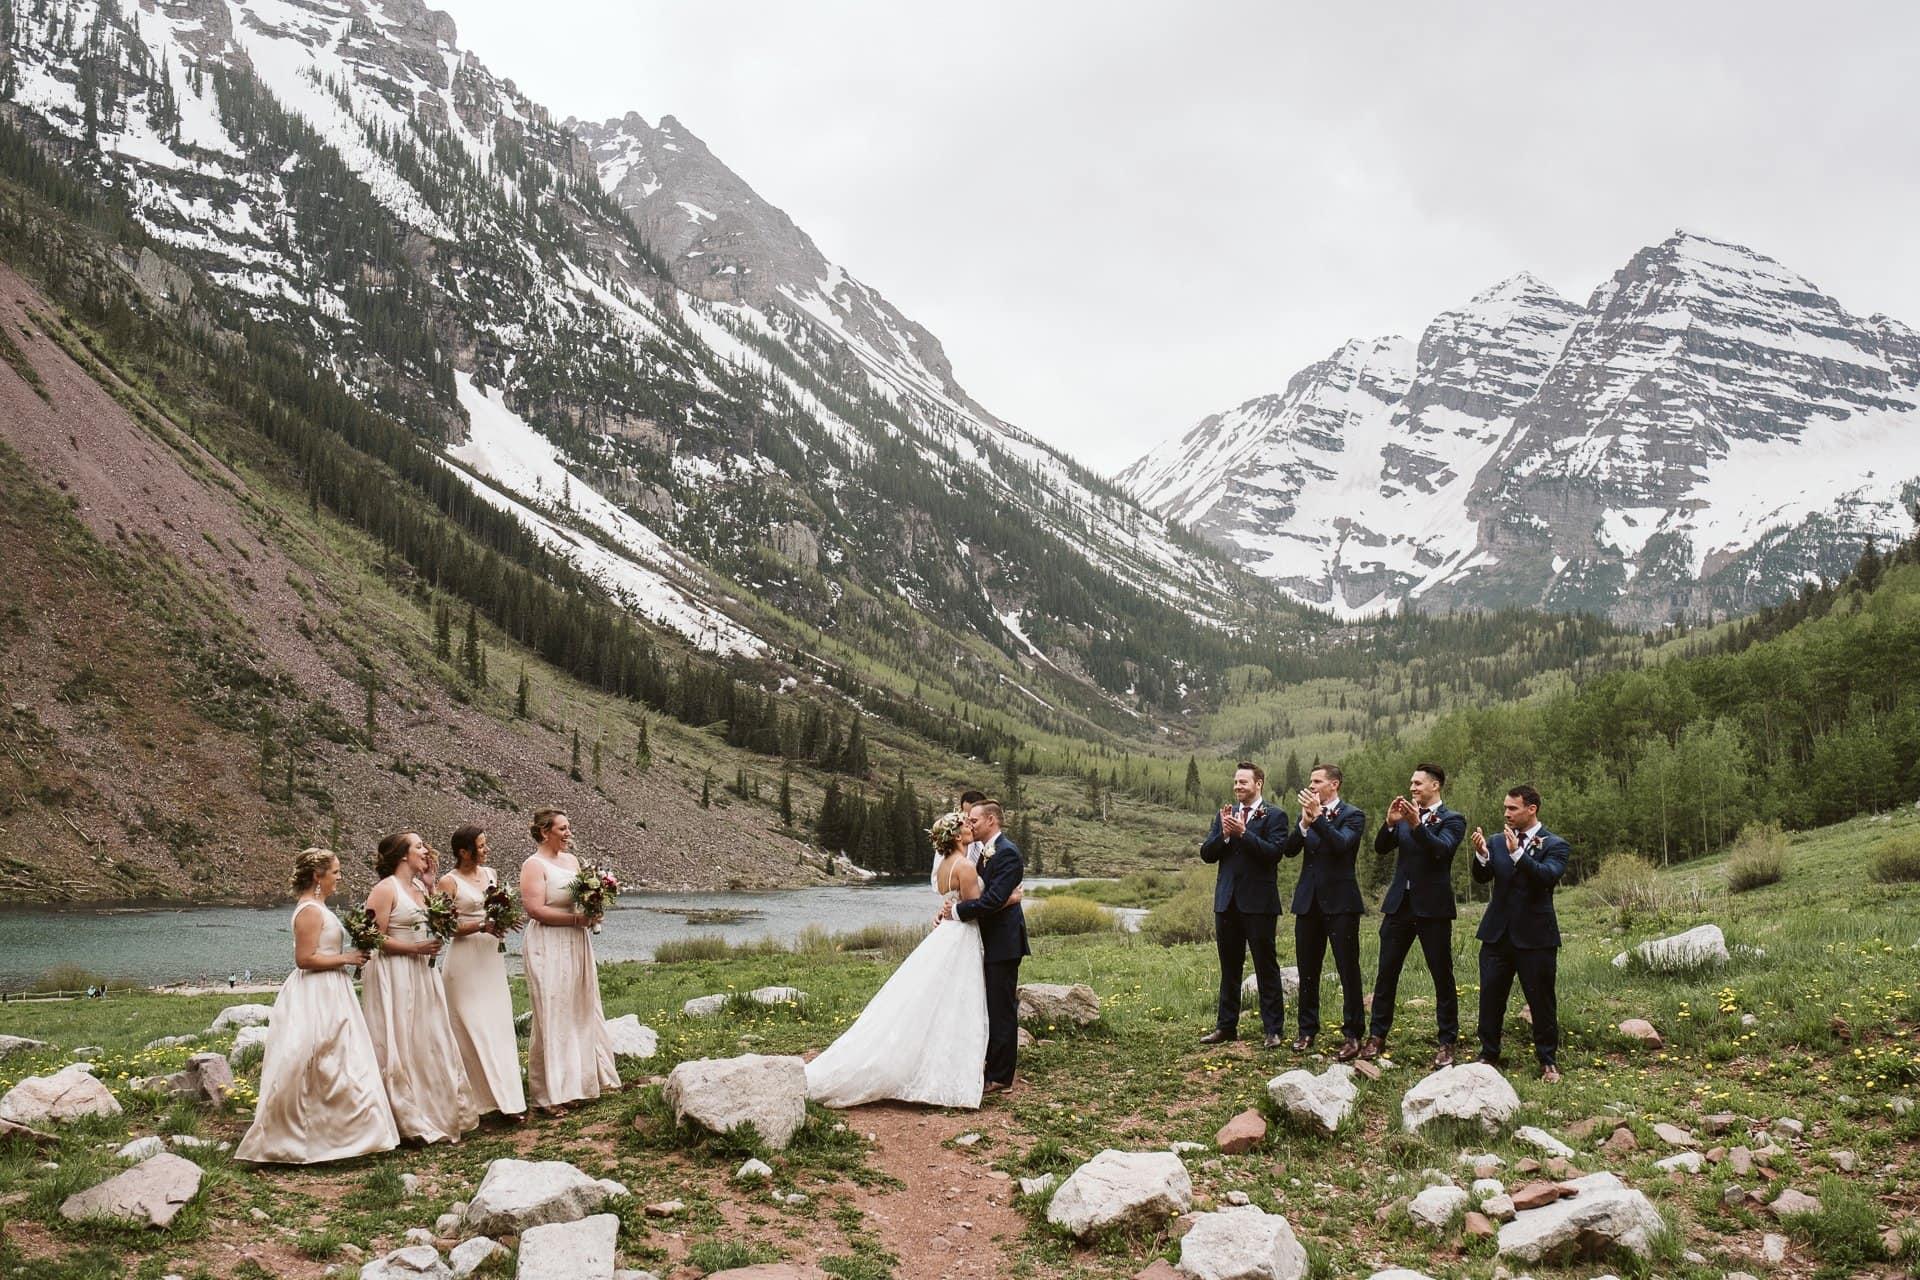 Wedding ceremony at Maroon Bells Amphitheater in Aspen